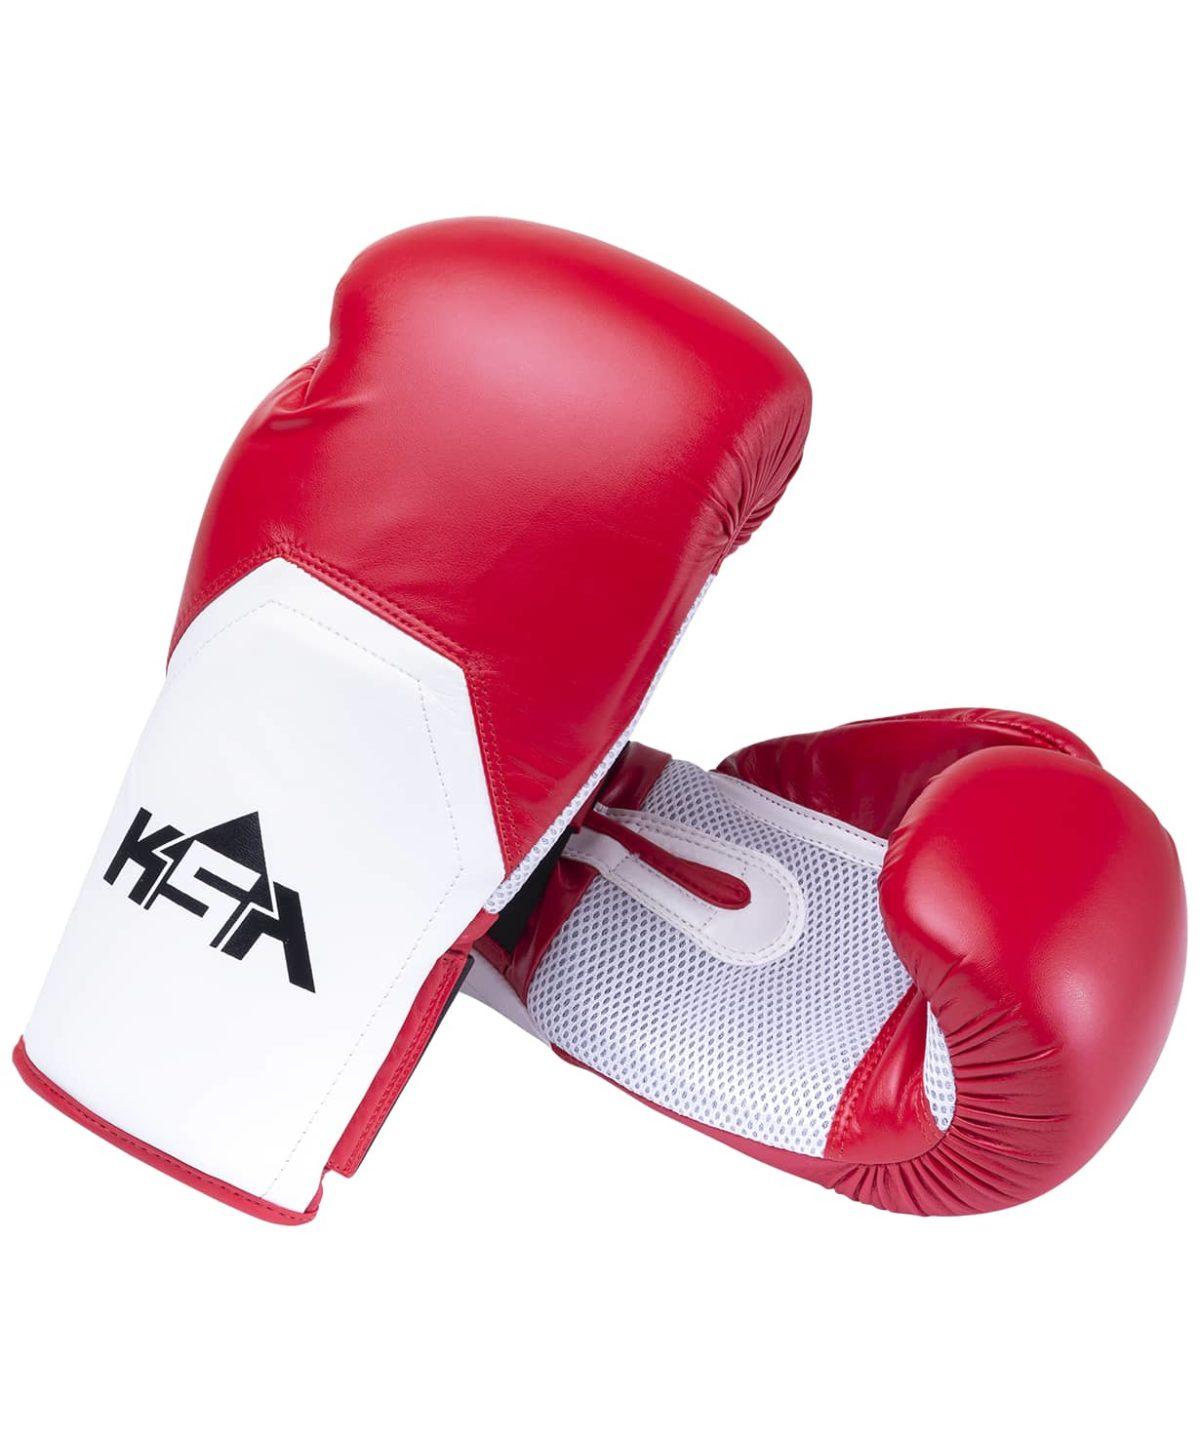 KSA Scorpio Red Перчатки боксерские, 6 oz, к/з  17822 - 1